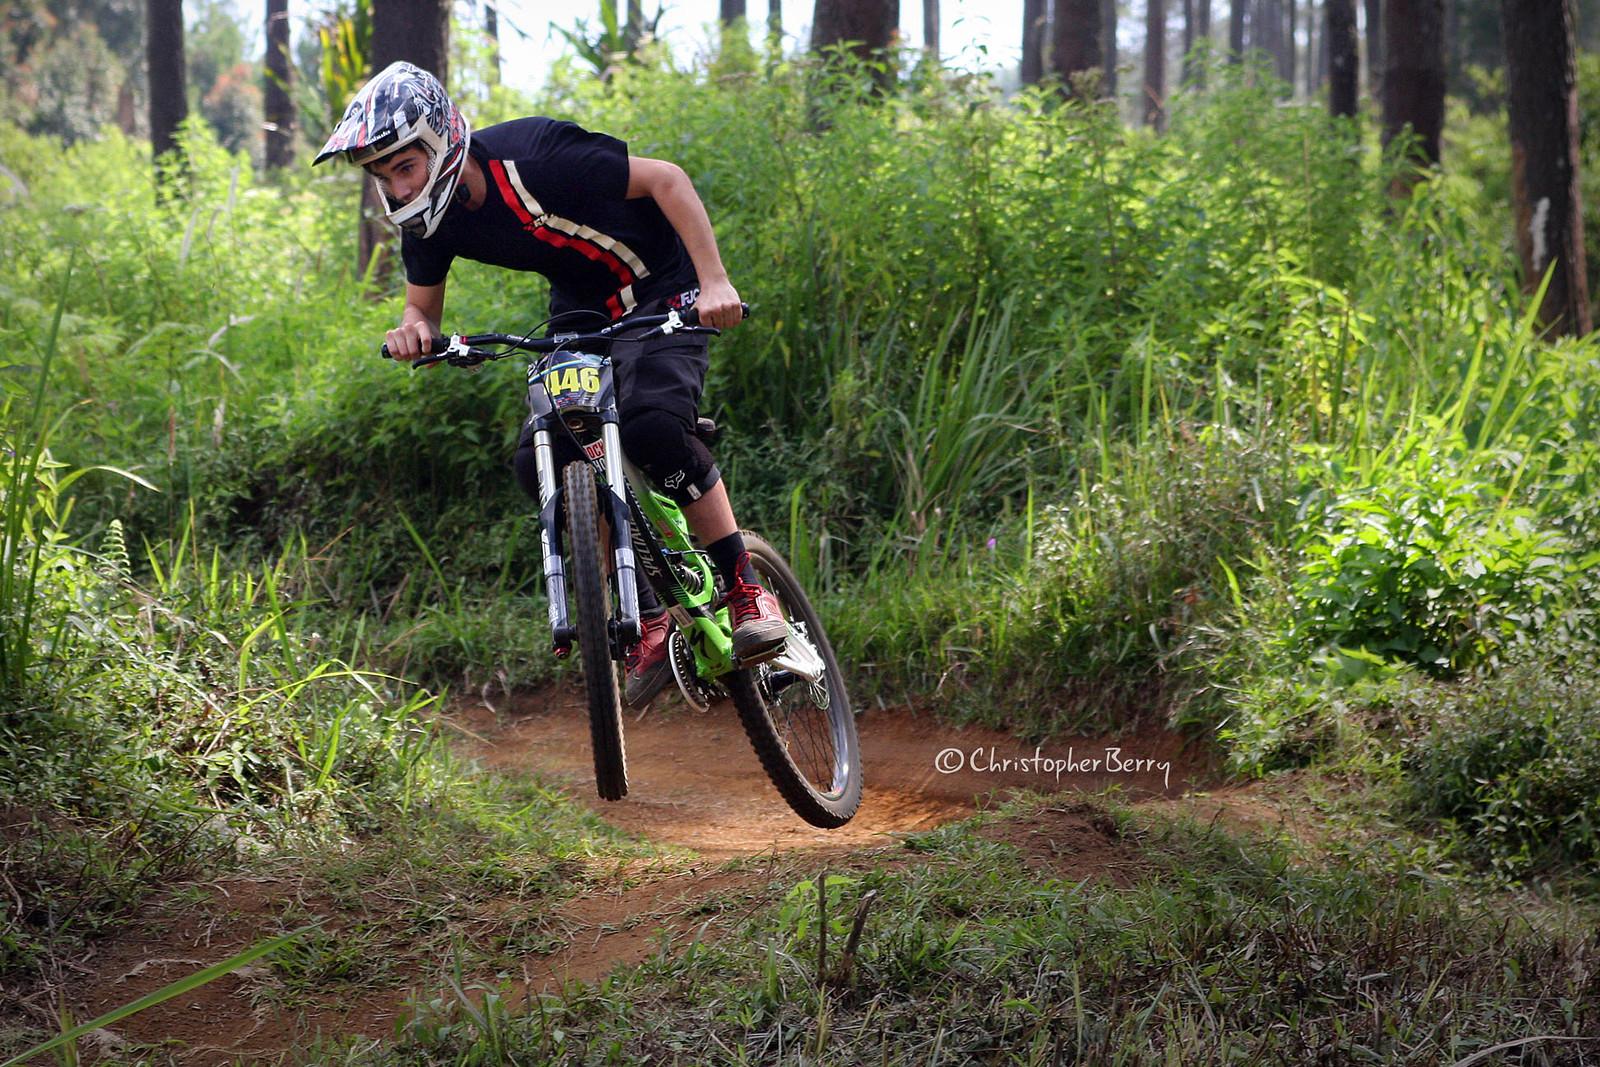 ShimanoUKDIseri02 - 0658 -mod - ombei - Mountain Biking Pictures - Vital MTB